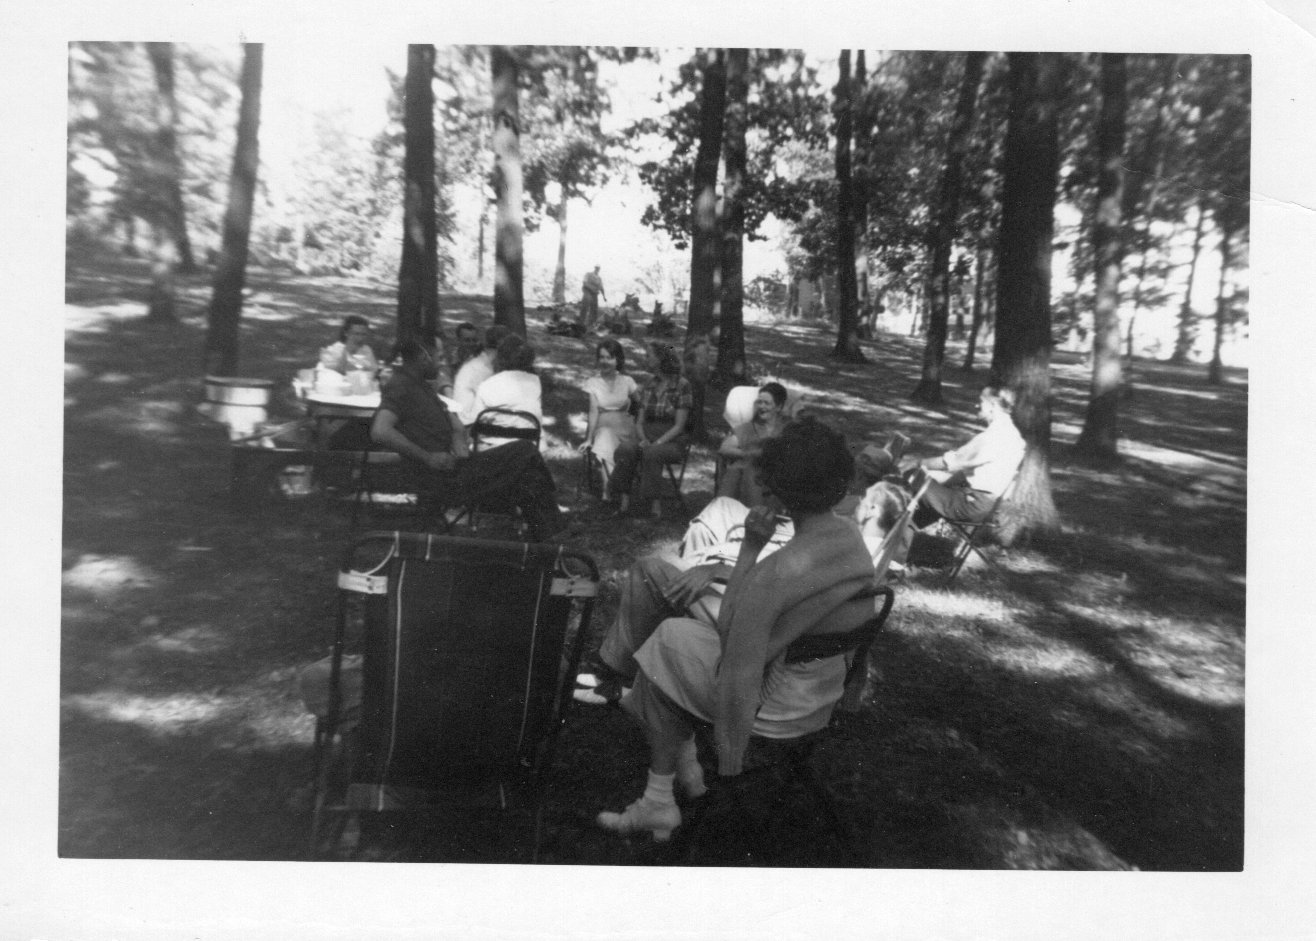 LVHSanPatientPicnicGroupAroundPicnicTable1949-1950